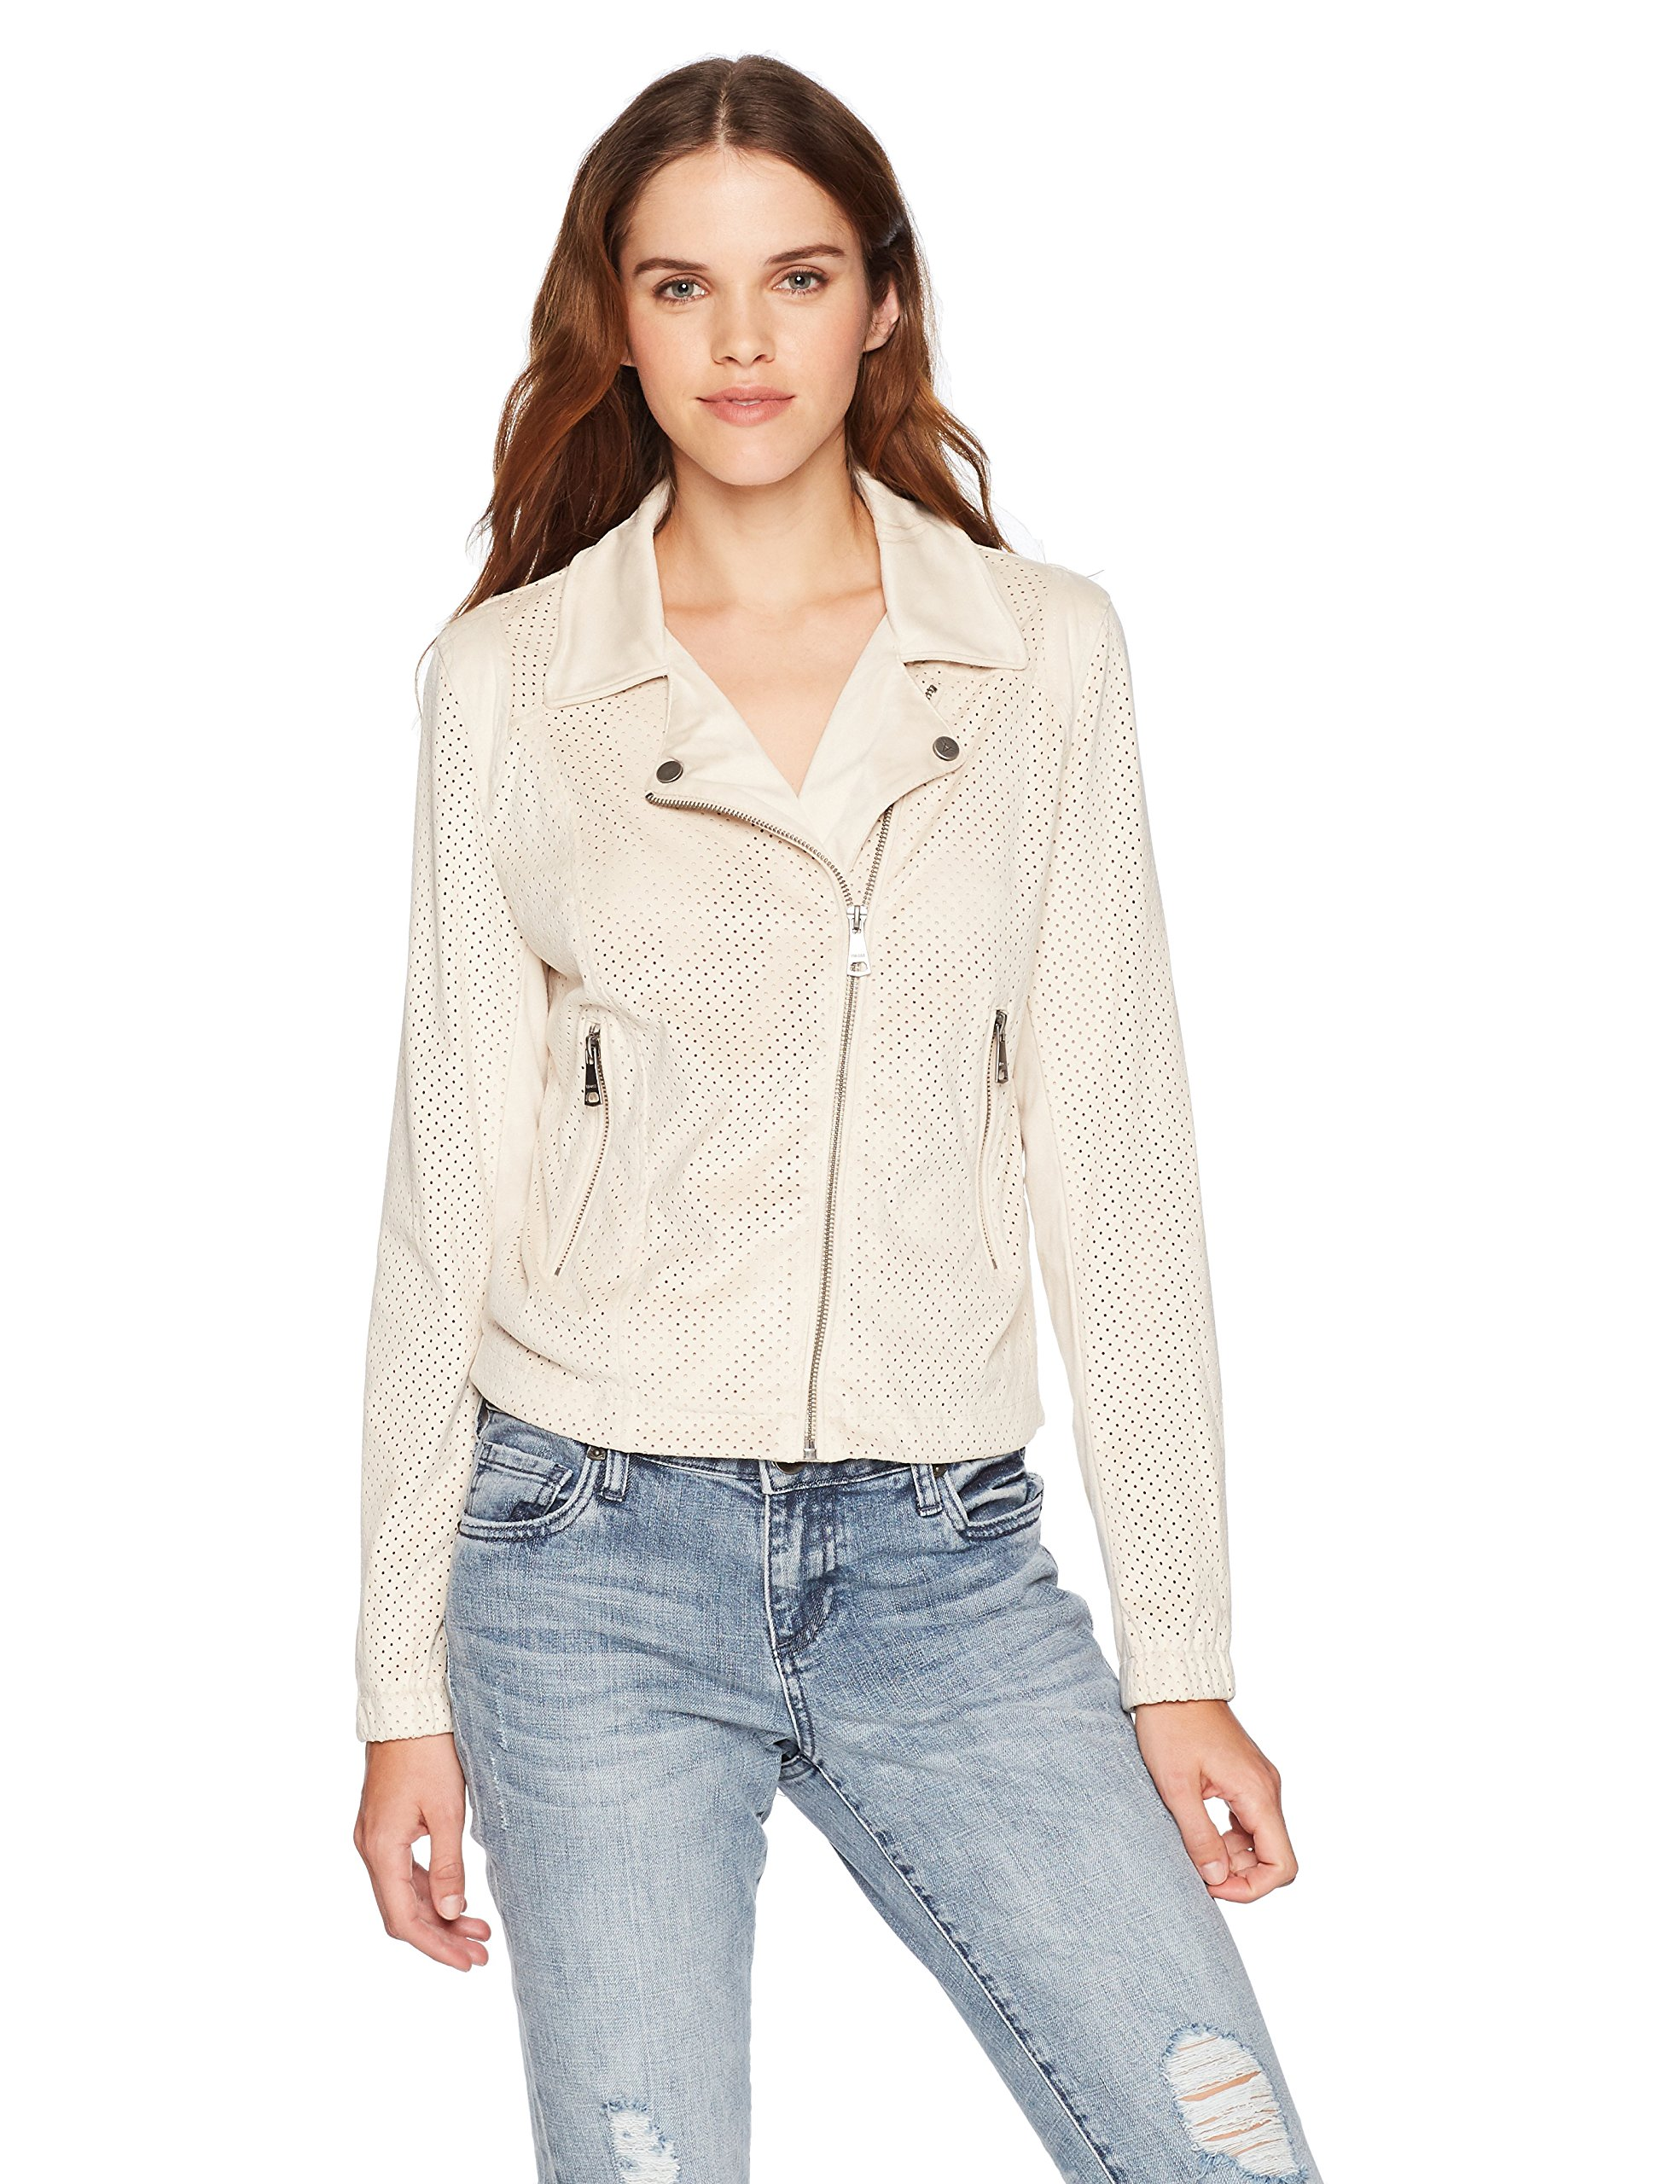 VIGOSS Women's Perforated Faux Suede Moto Jacket, Cloud, Medium